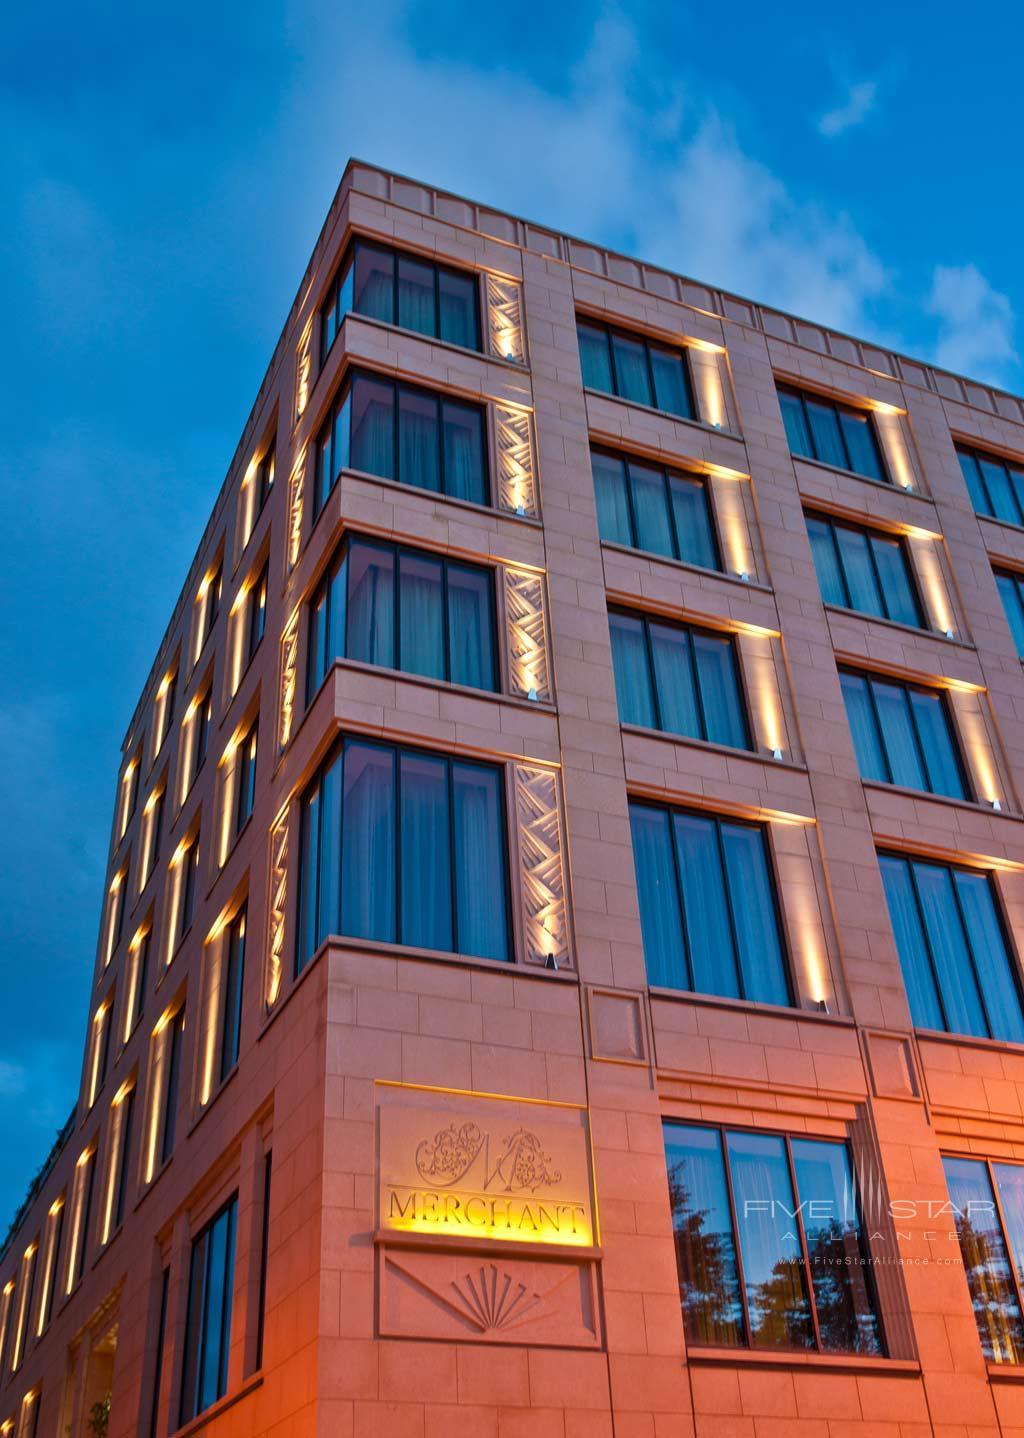 Merchant Hotel Spa Offers